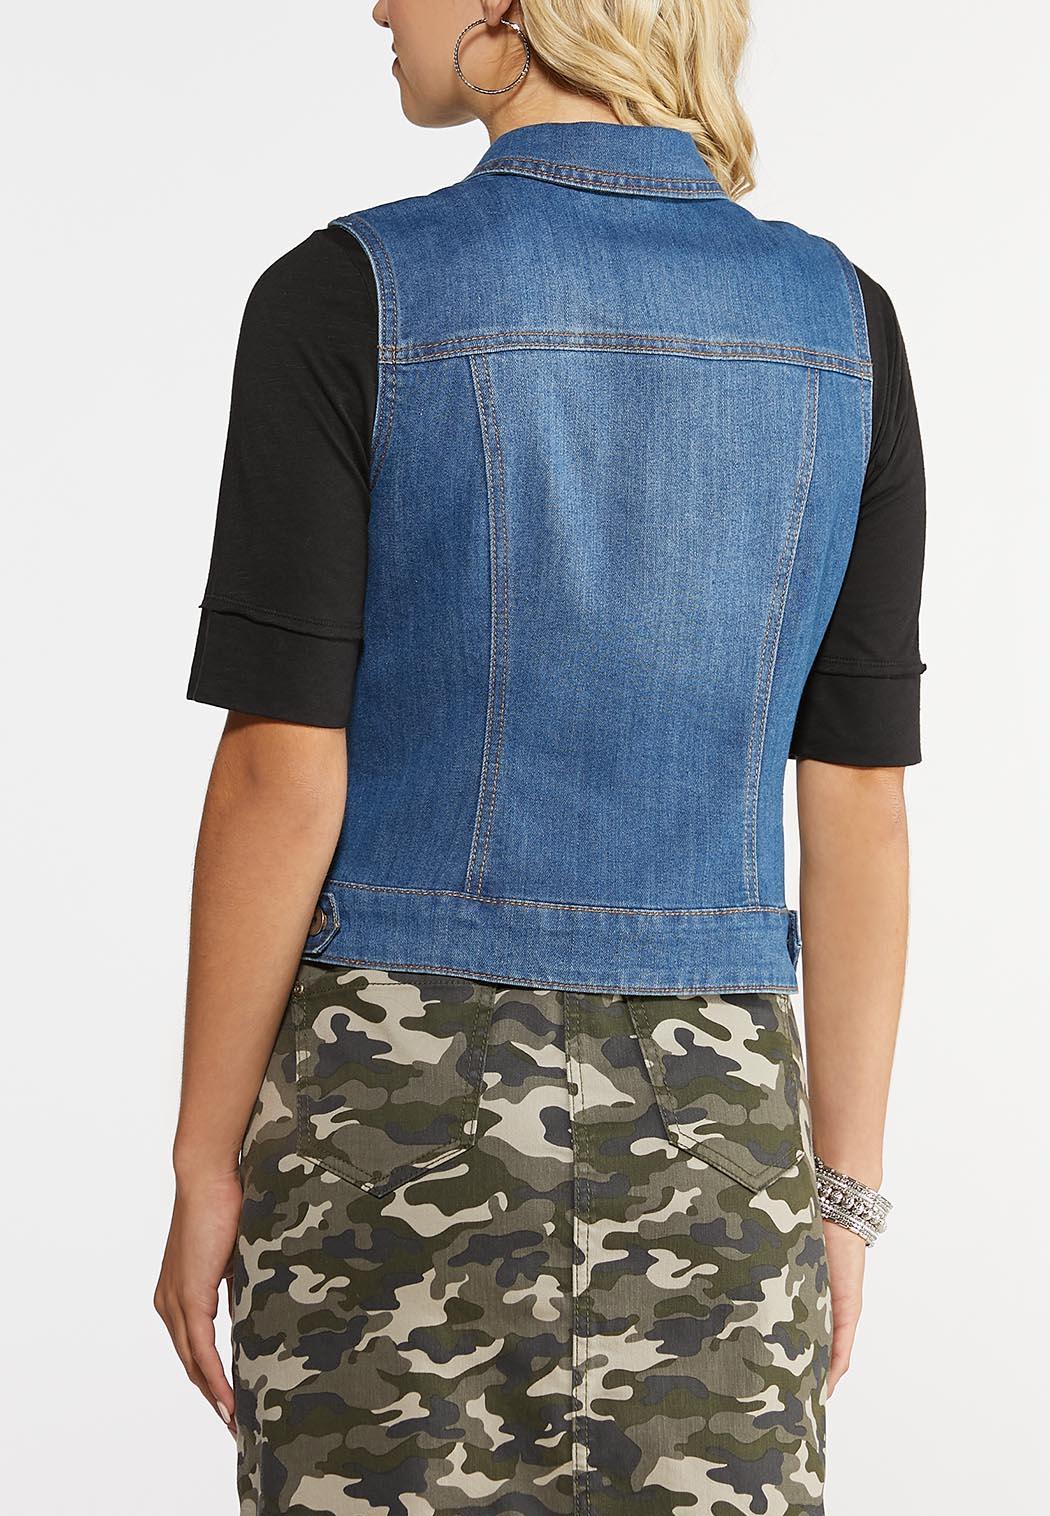 Studded Denim Vest (Item #43969667)